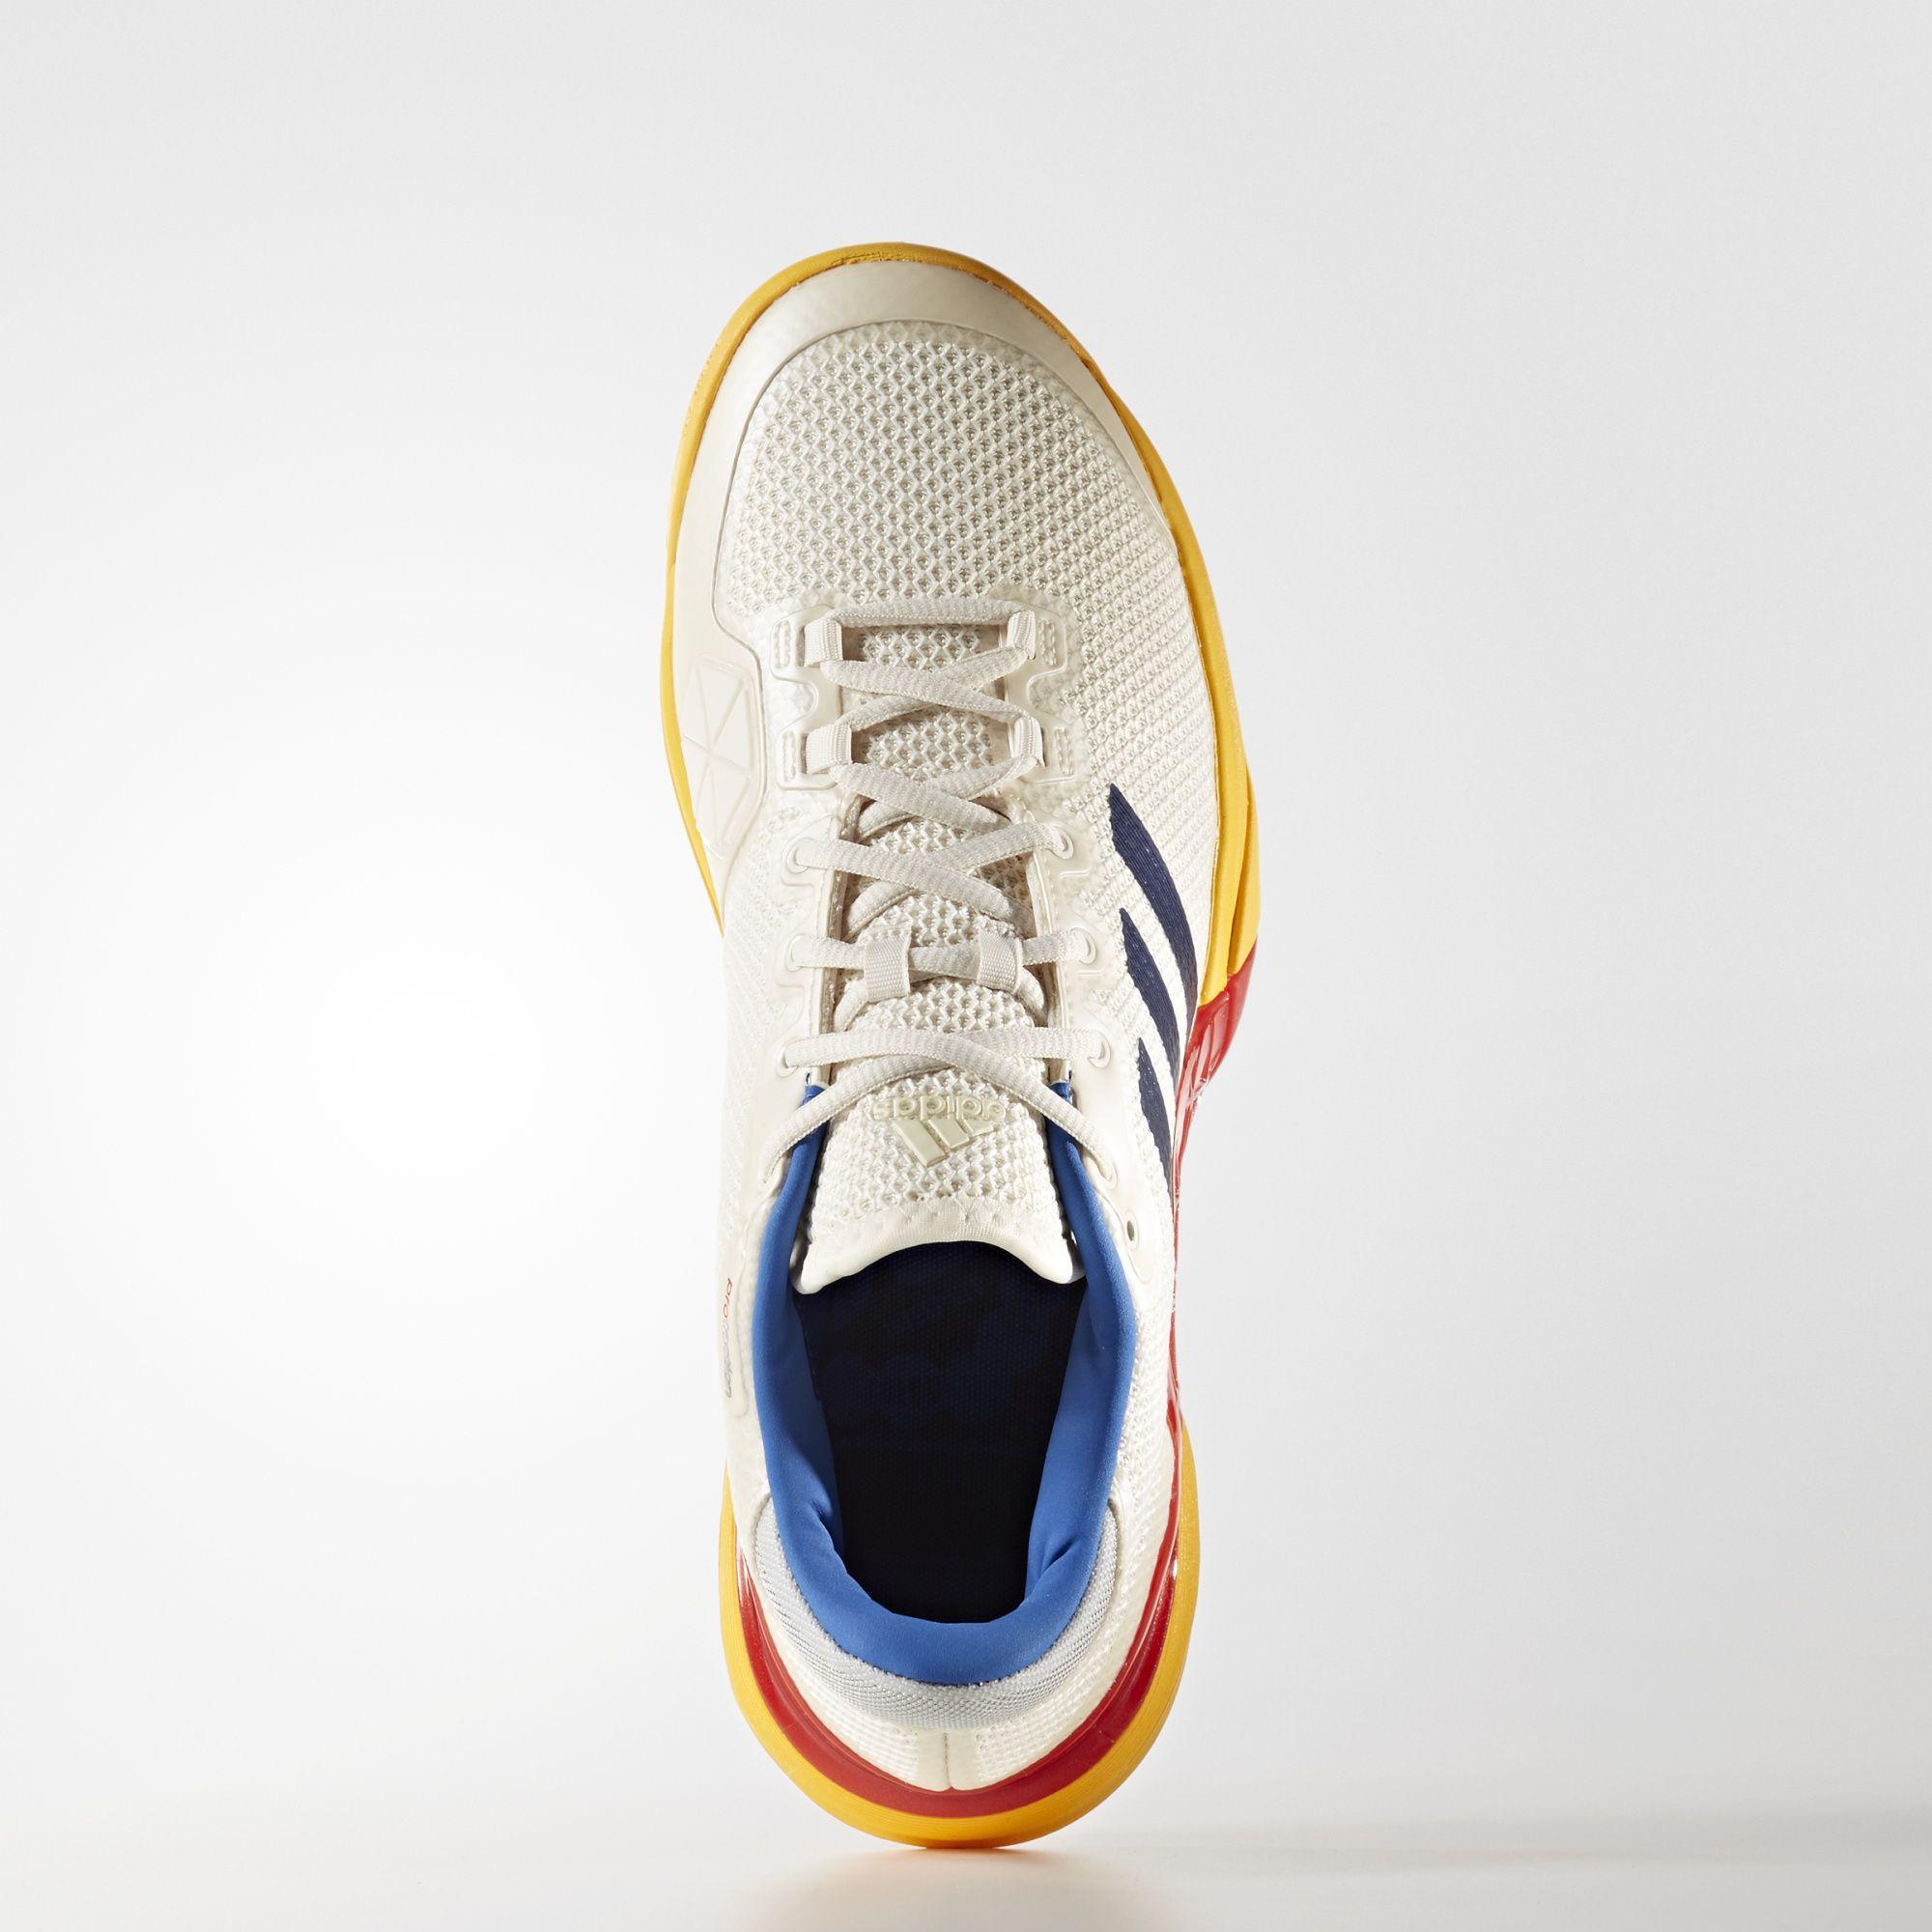 763c4a1f3db45 Adidas Mens Barricade 2017 Pharrell Williams Tennis Shoes - Multi-Colour